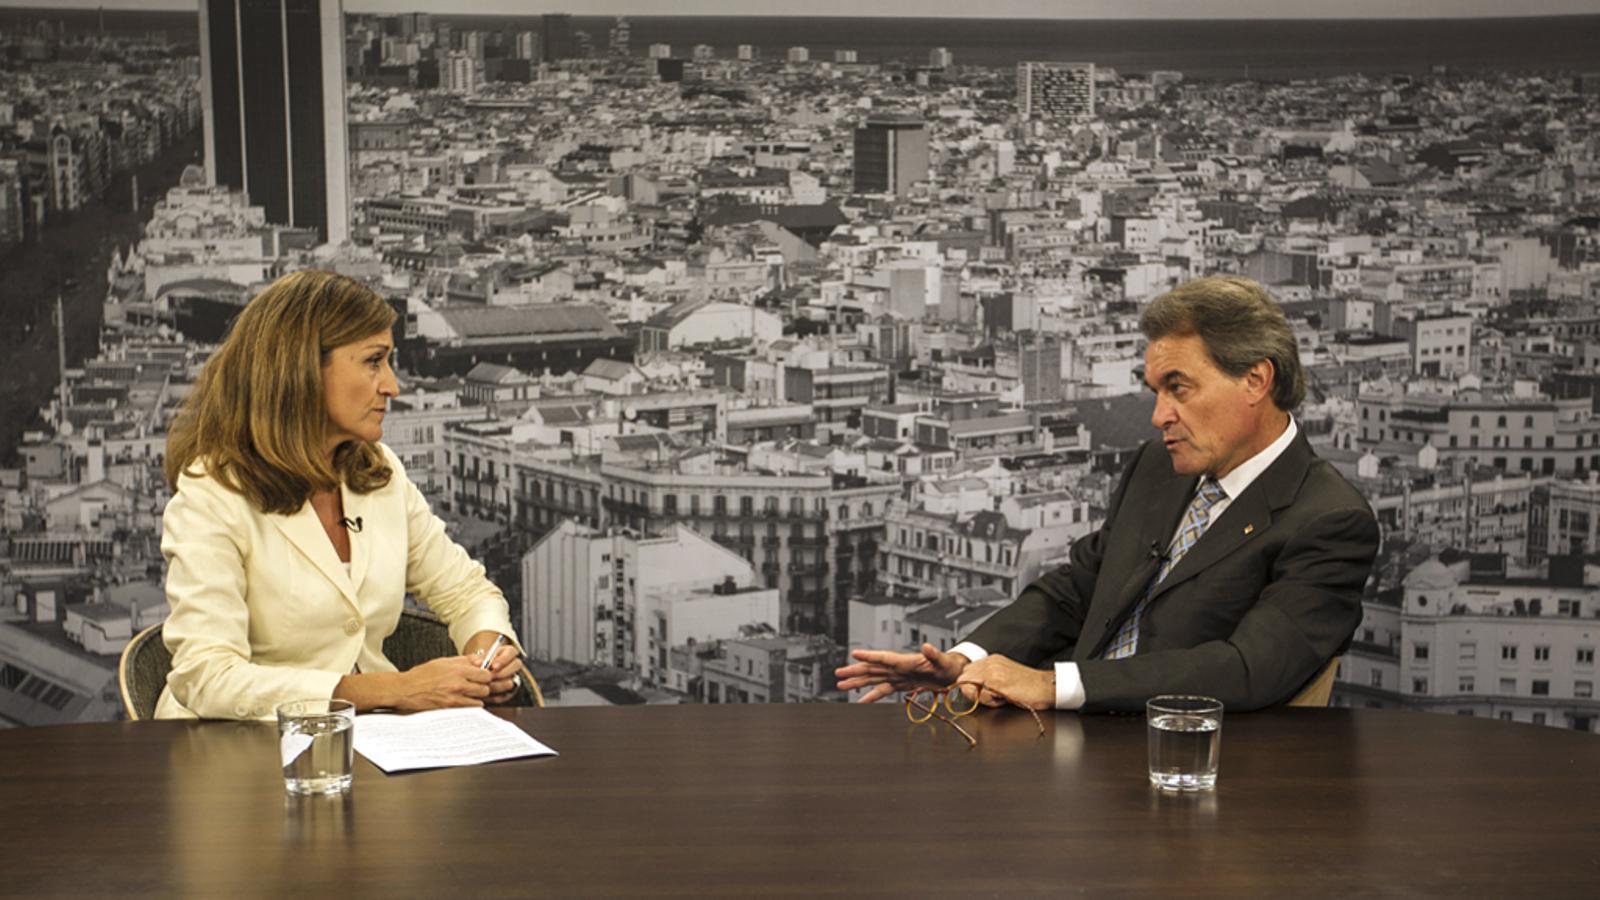 Entrevista d'Esther Vera a Artur Mas